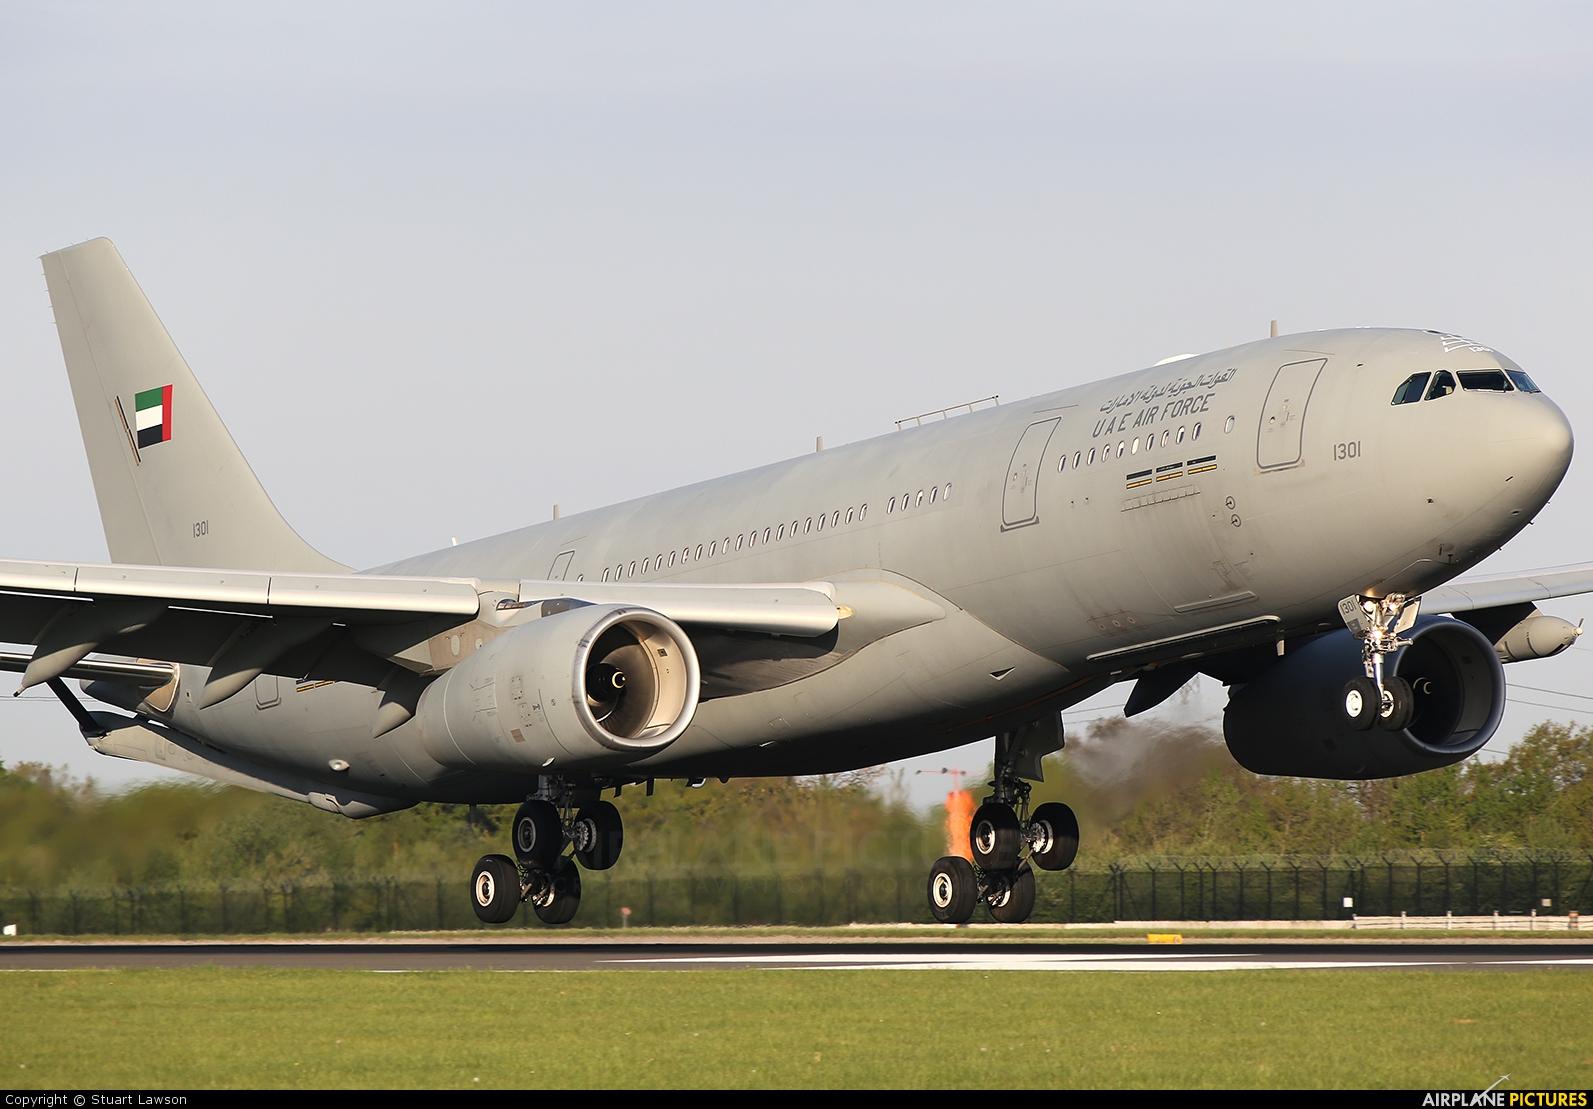 United Arab Emirates - Air Force 1301 aircraft at Manchester